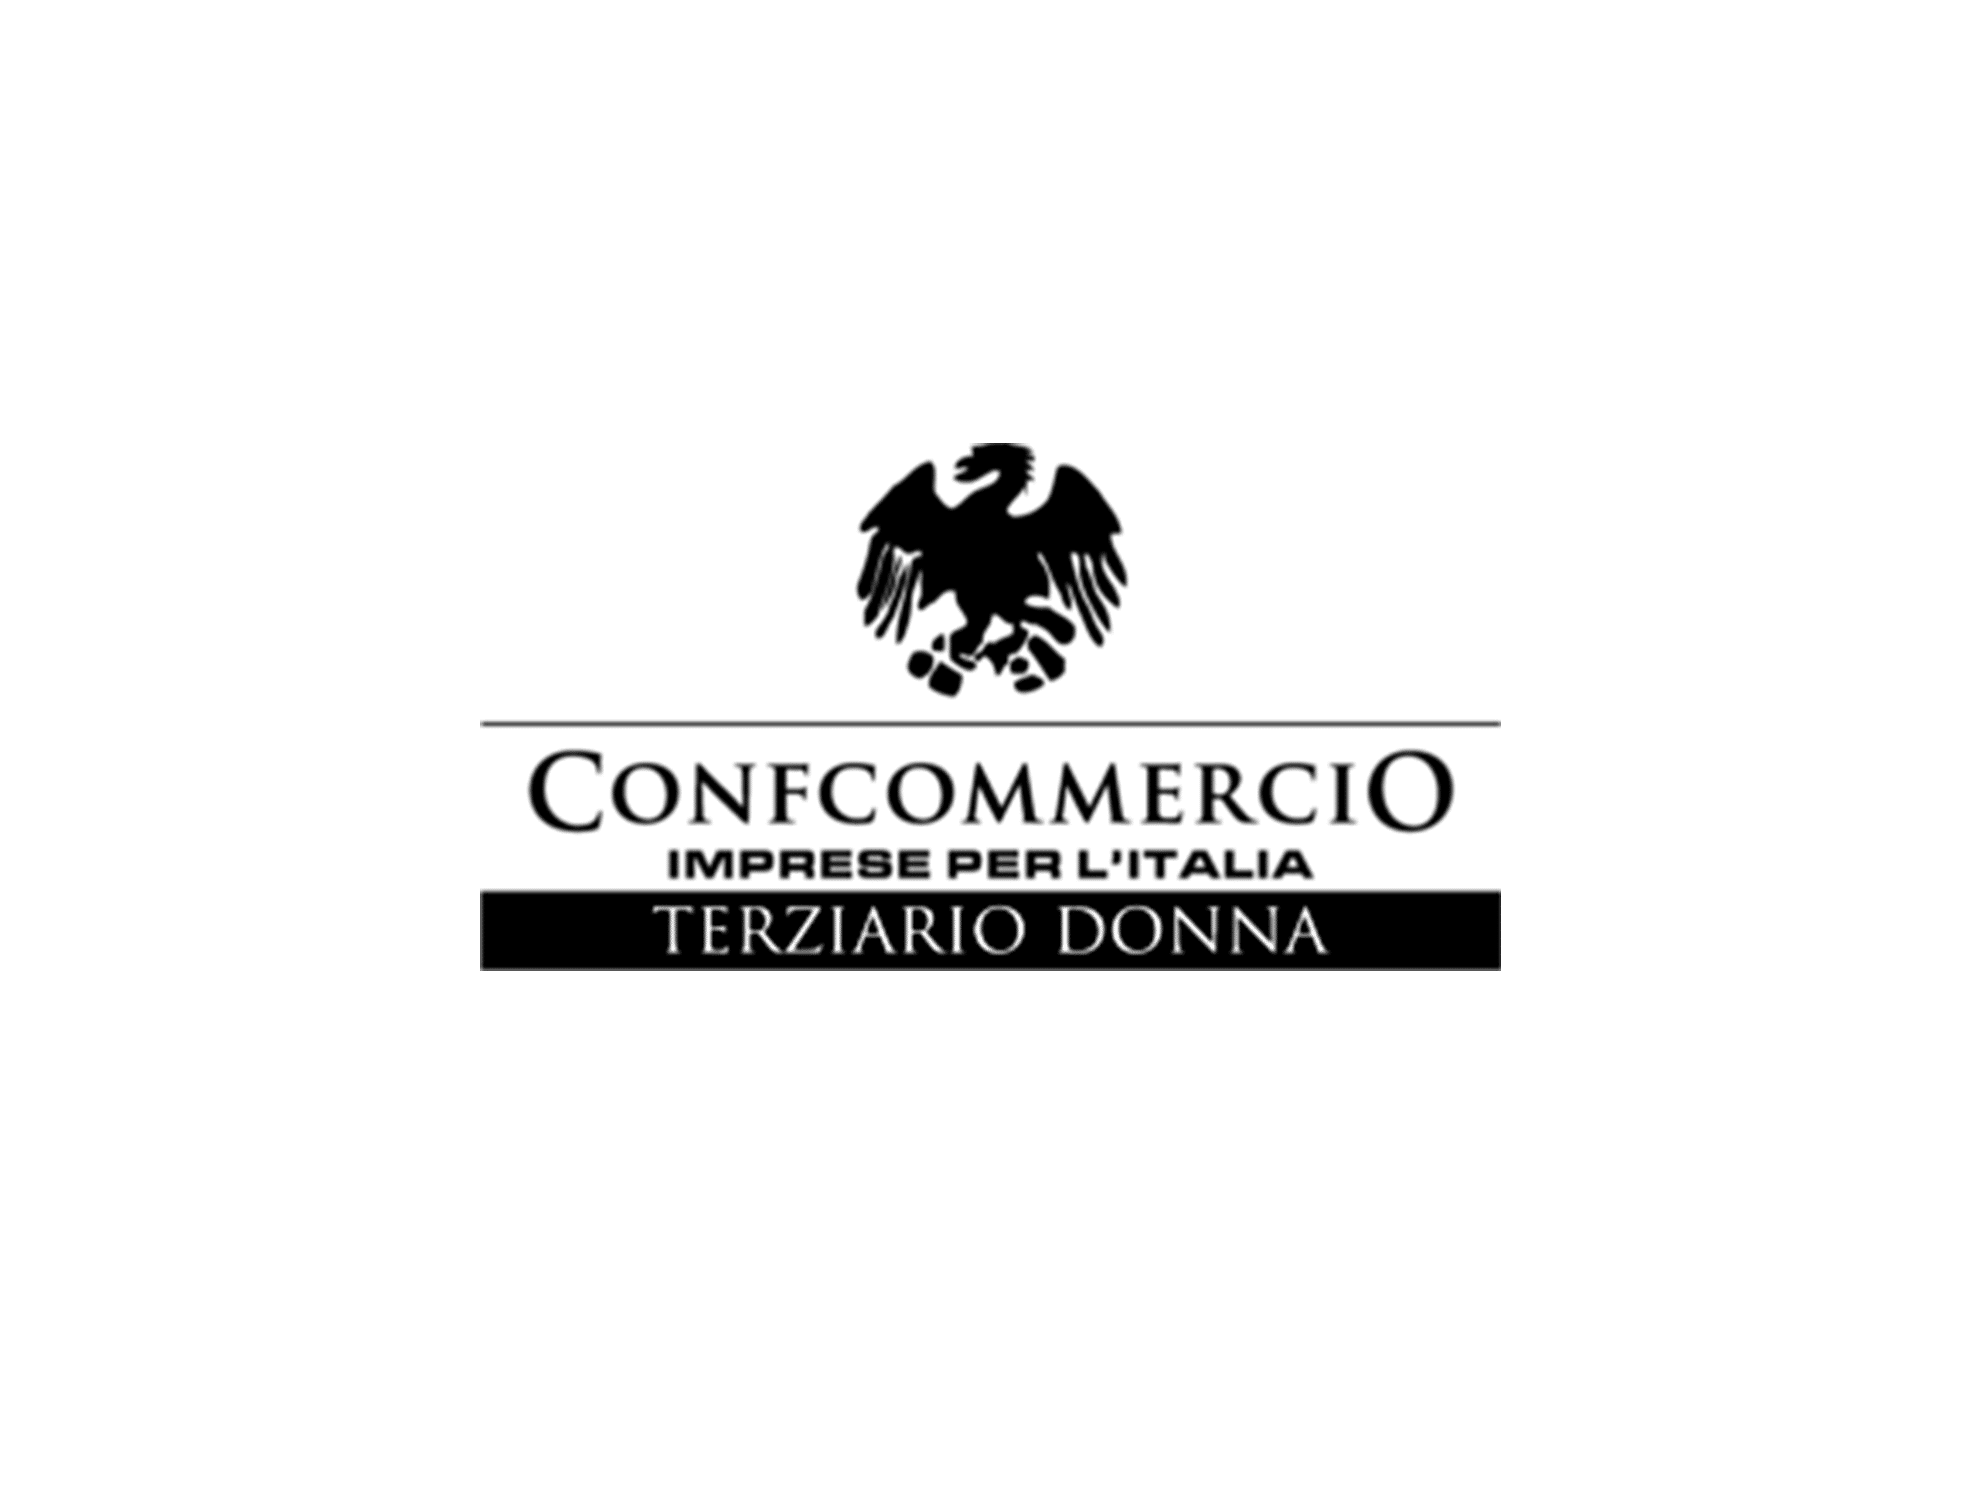 Logo Terziario Donna bw - baldassarre - agenzia comunicazione